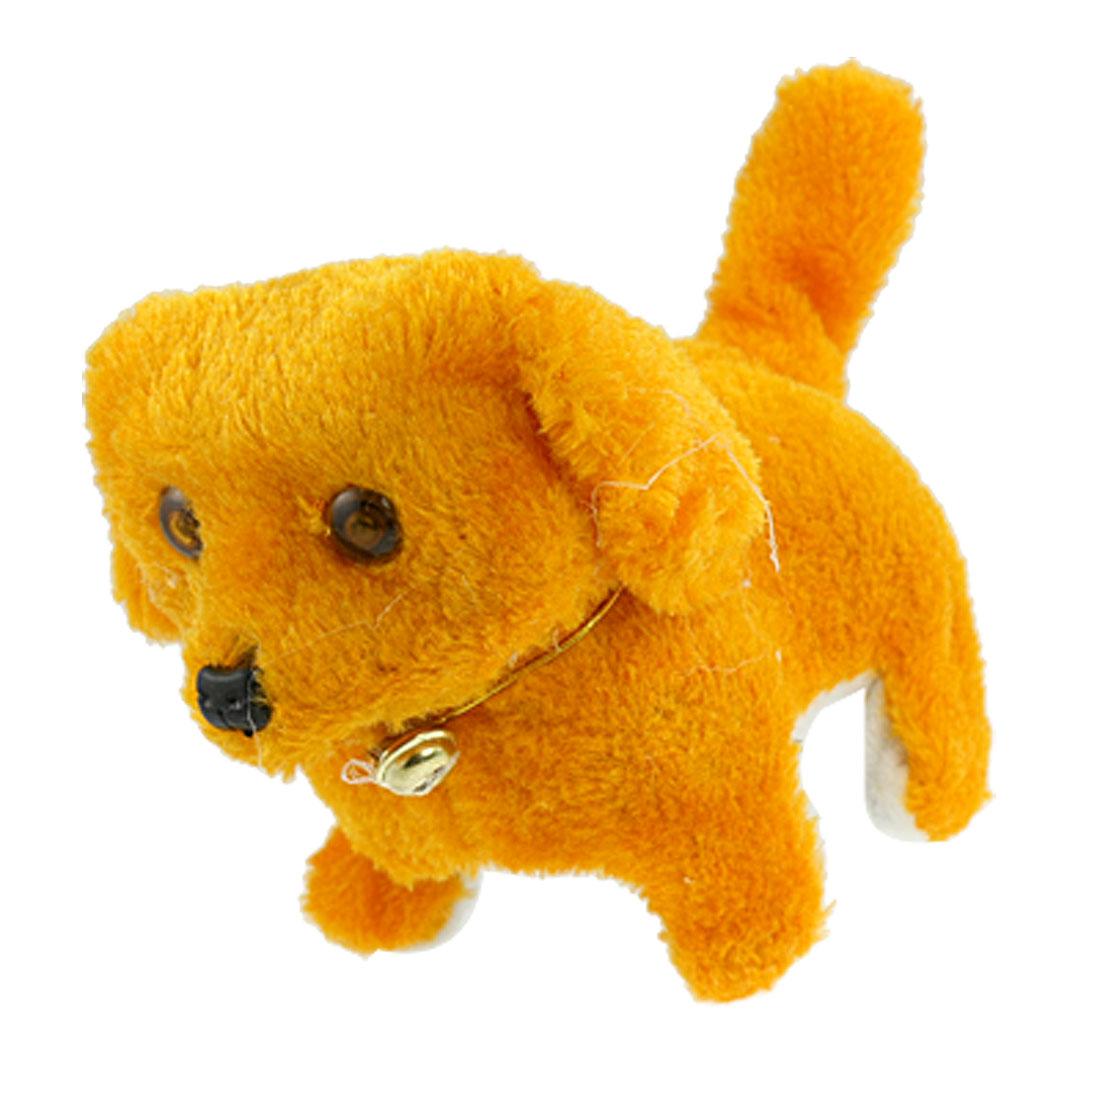 Child Orange Plush Battery Powered Walk Cartoon Dog Toy Gift